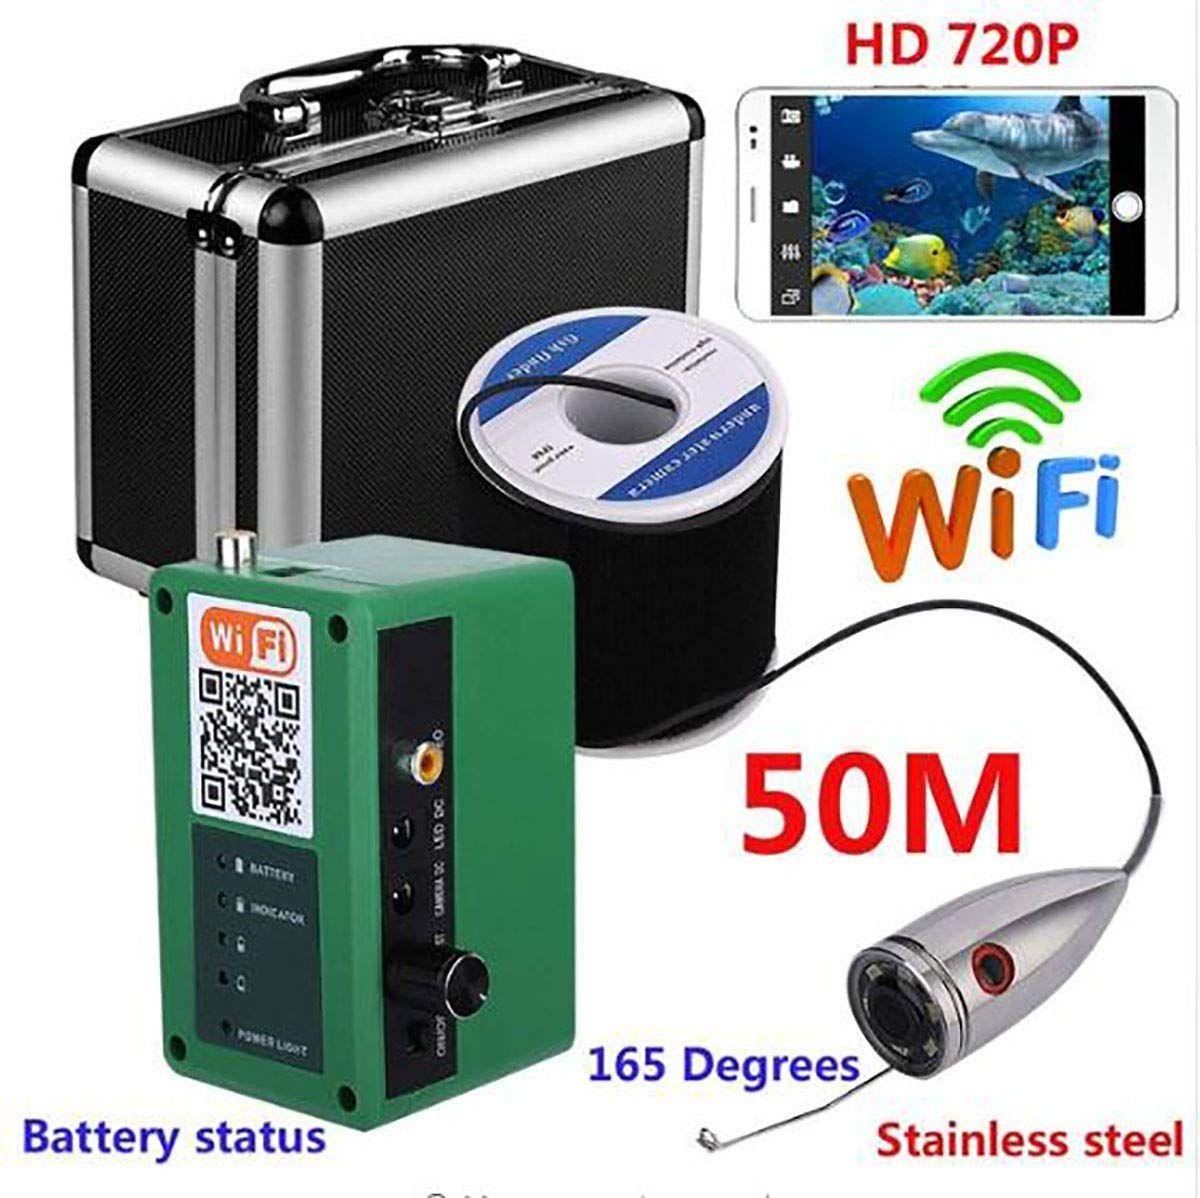 NYWOUT 720P WiFi Wireless Underwater Fishing Video Camera